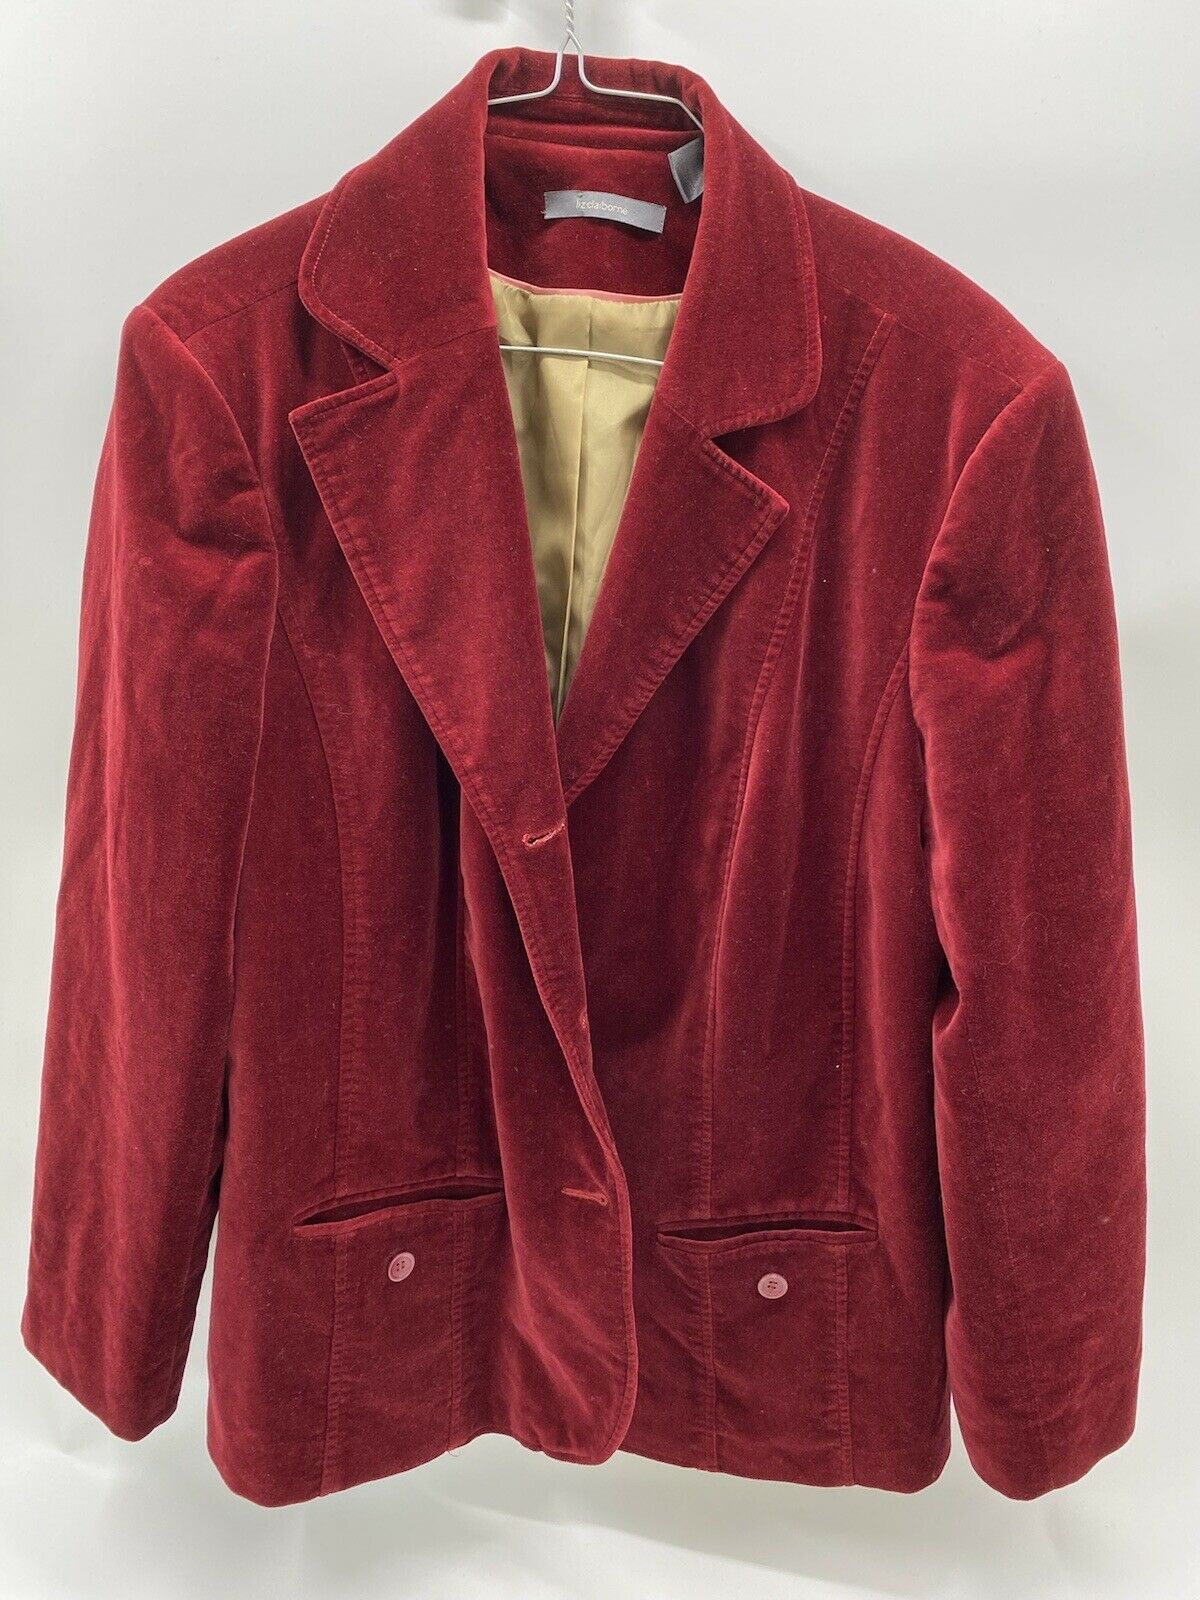 Liz Claiborne Red suede lined jacket/blazer Mediu… - image 1